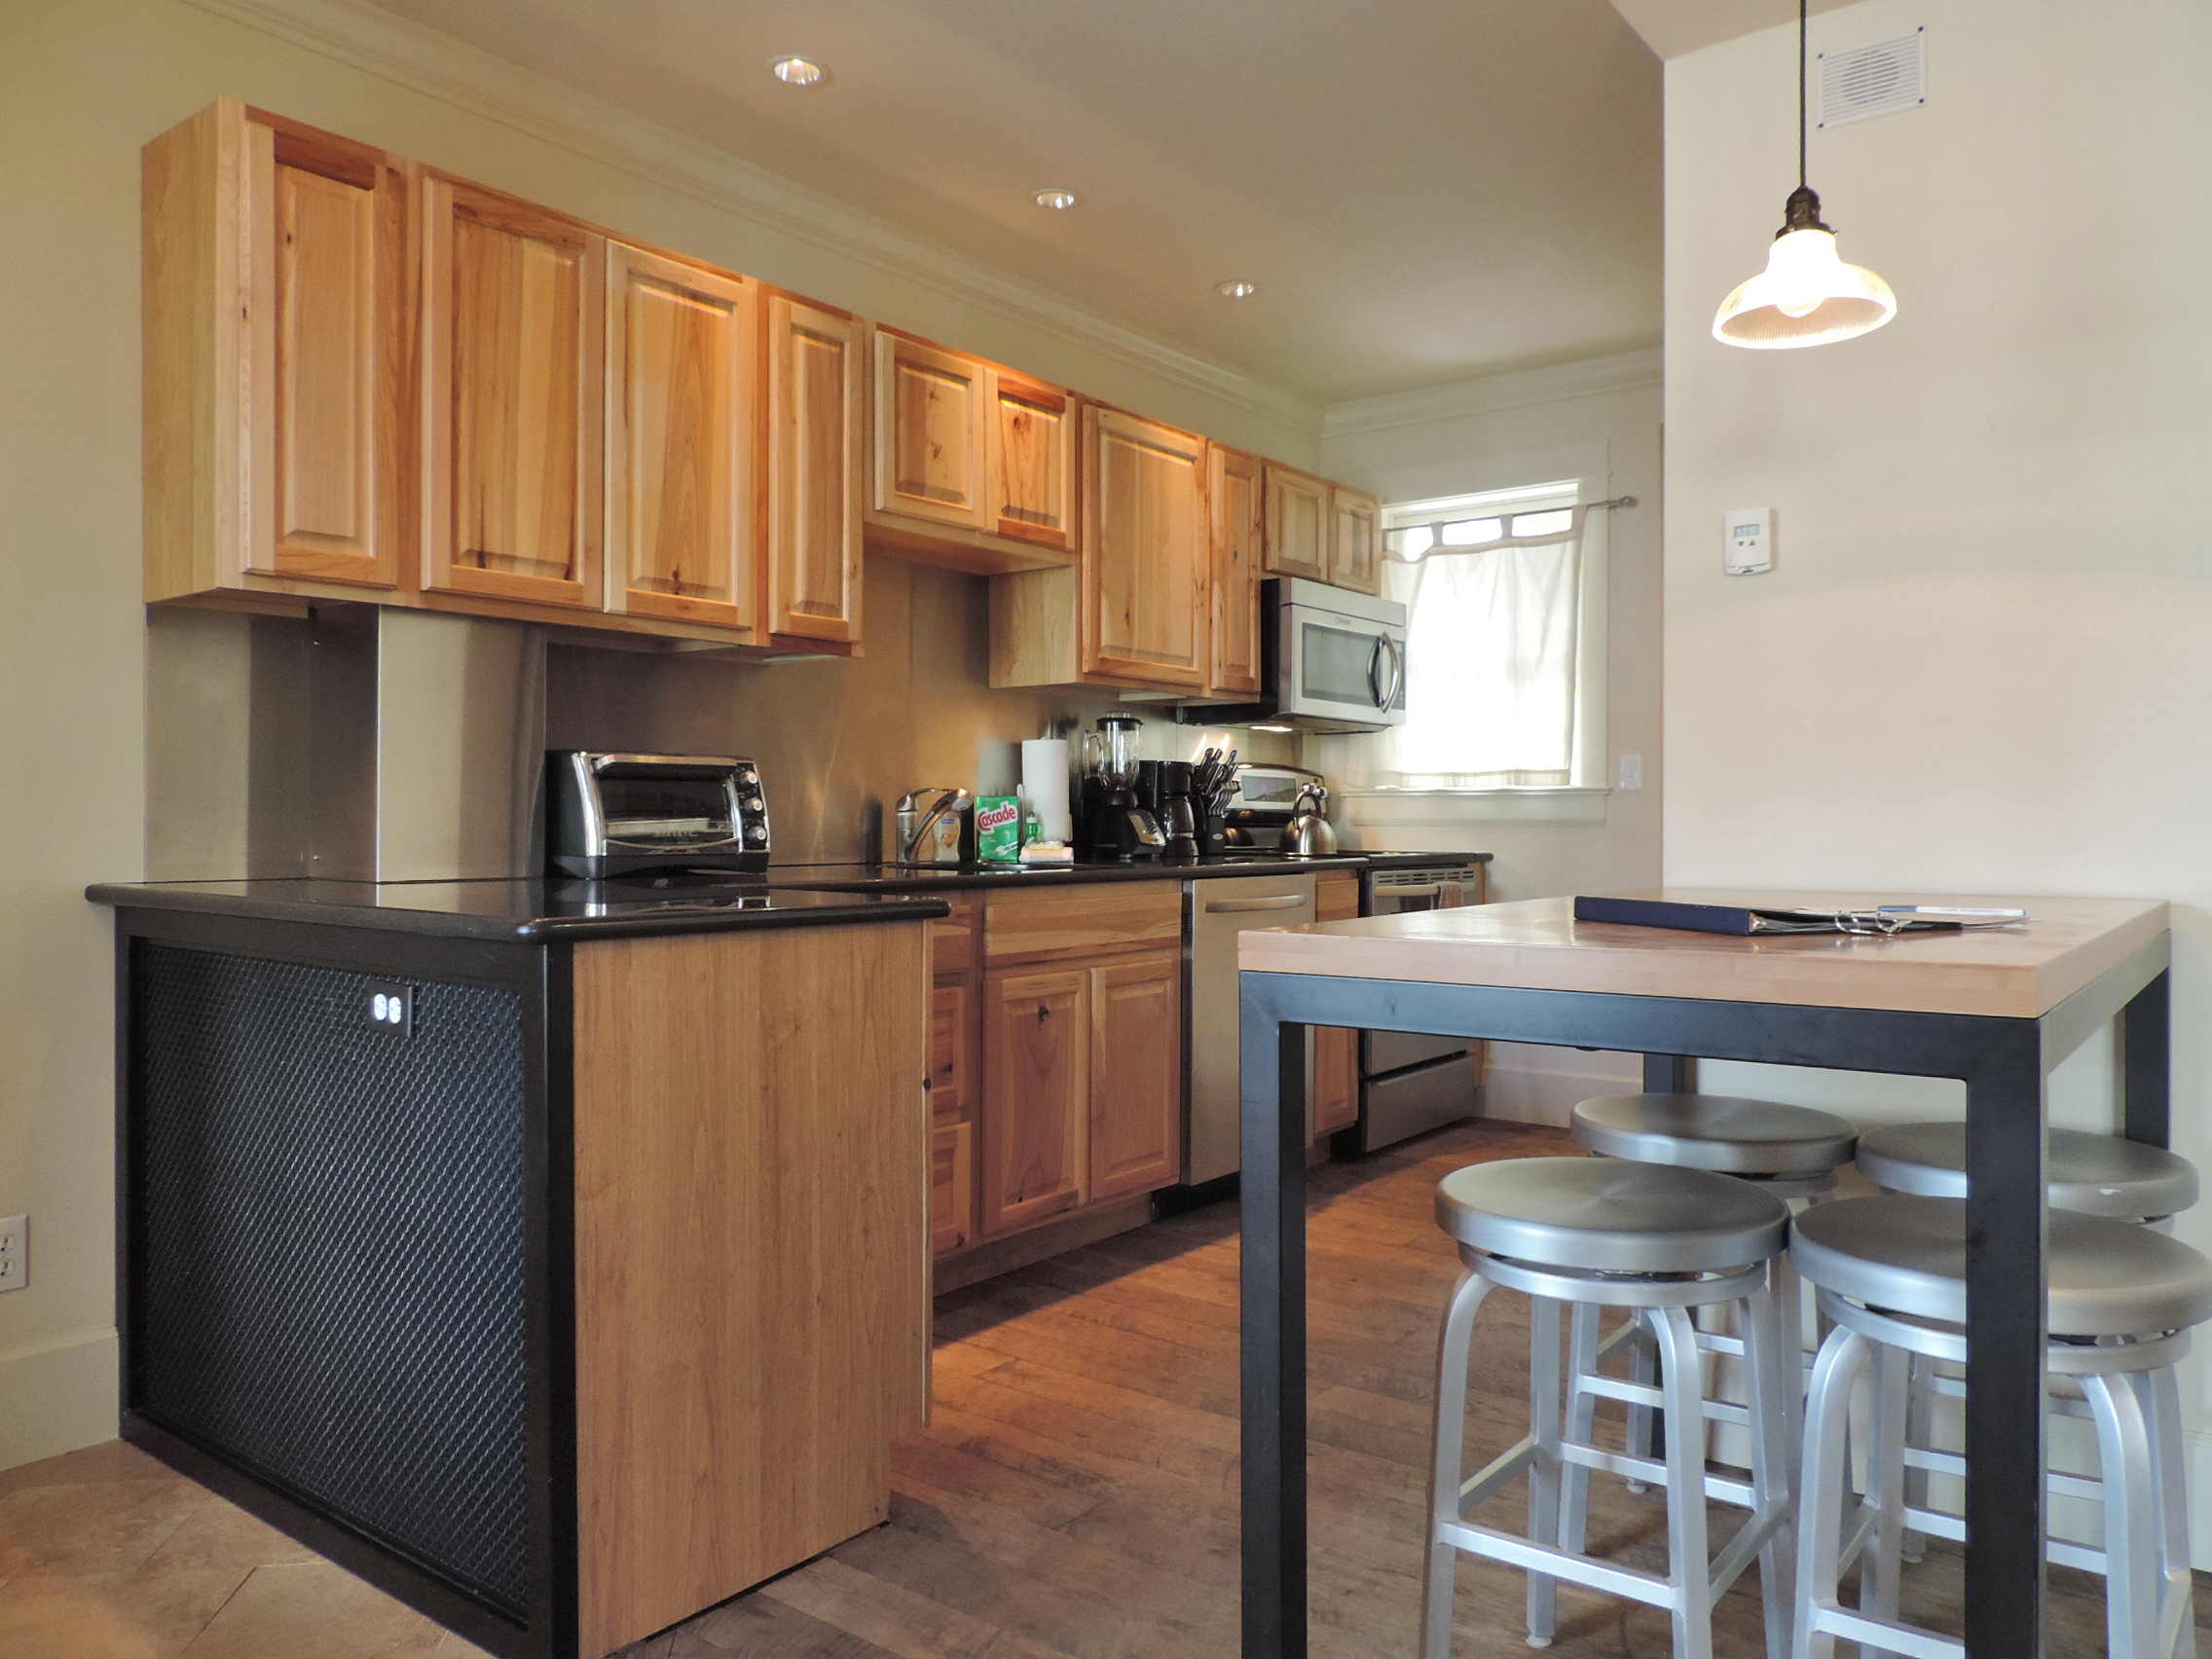 Montana Placer Inn Unit 1 - 1 Bd/1 Ba Condo, Sleeps 5 - Fully Equipped Kitchen